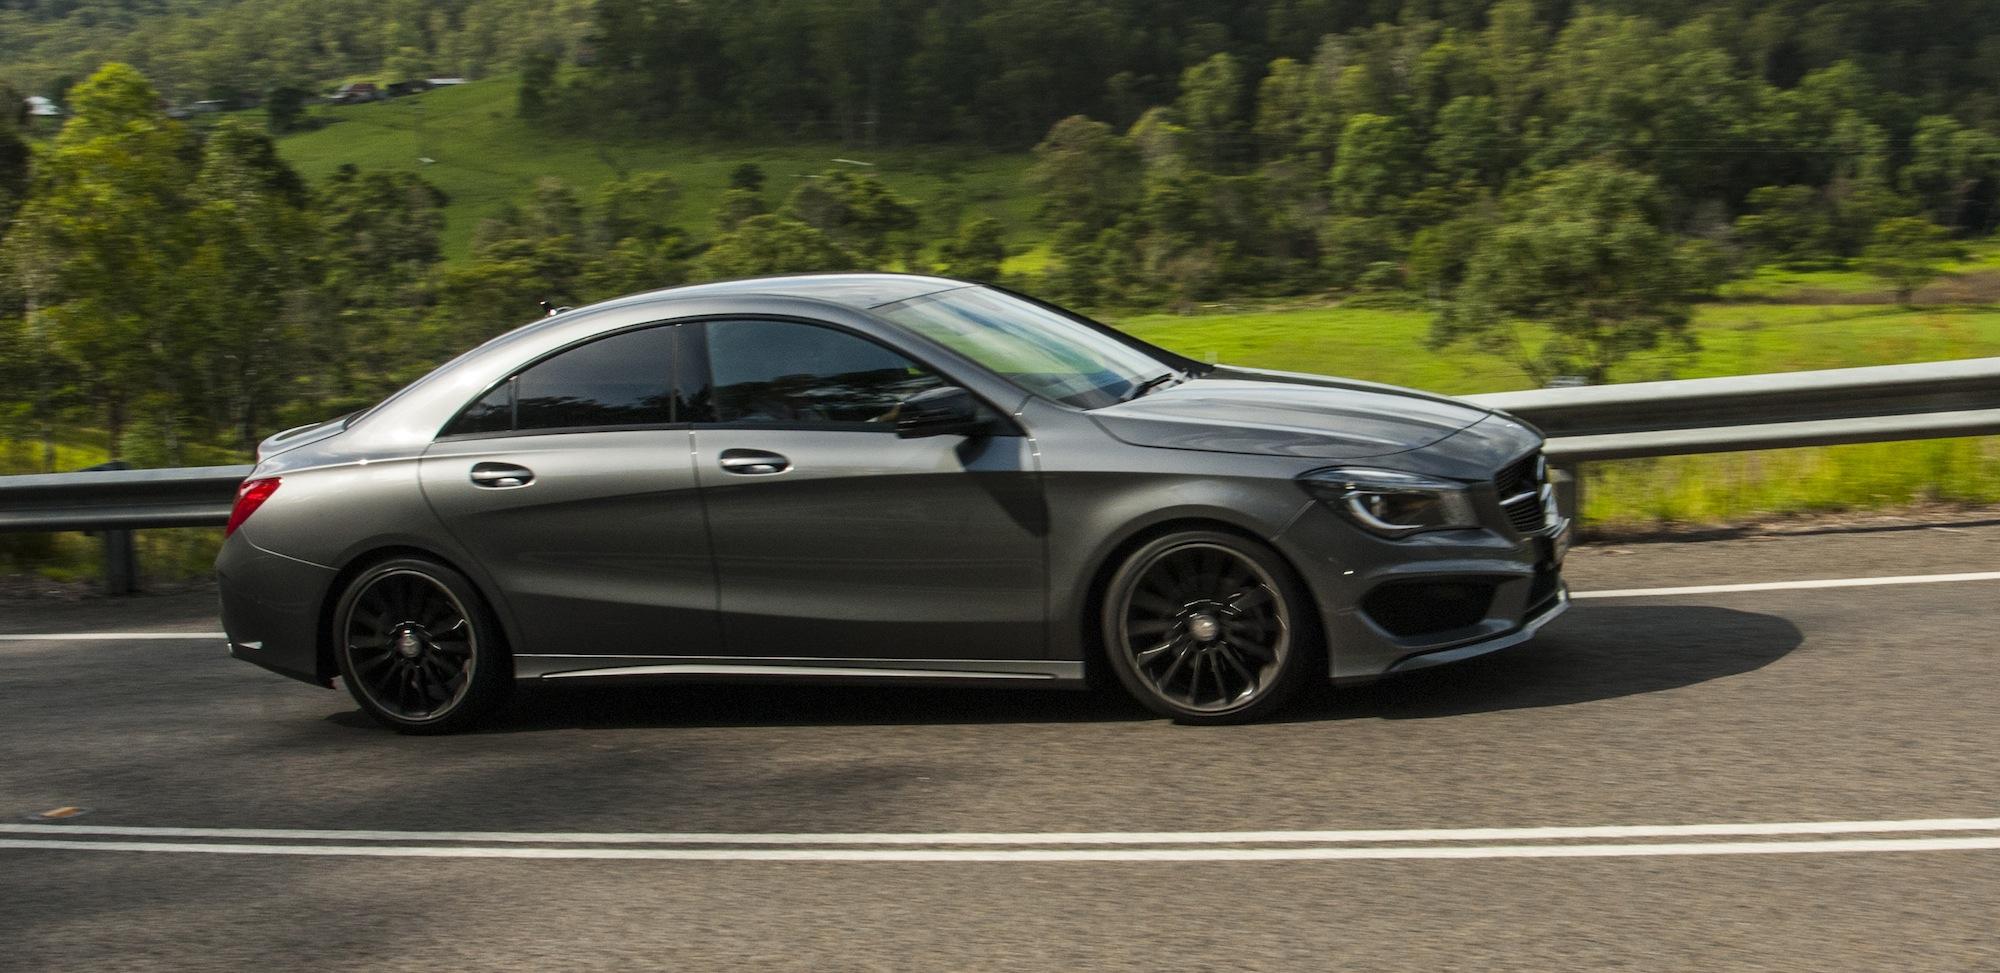 Audi a3 sedan v mercedes benz cla class comparison for Mercedes benz cla review